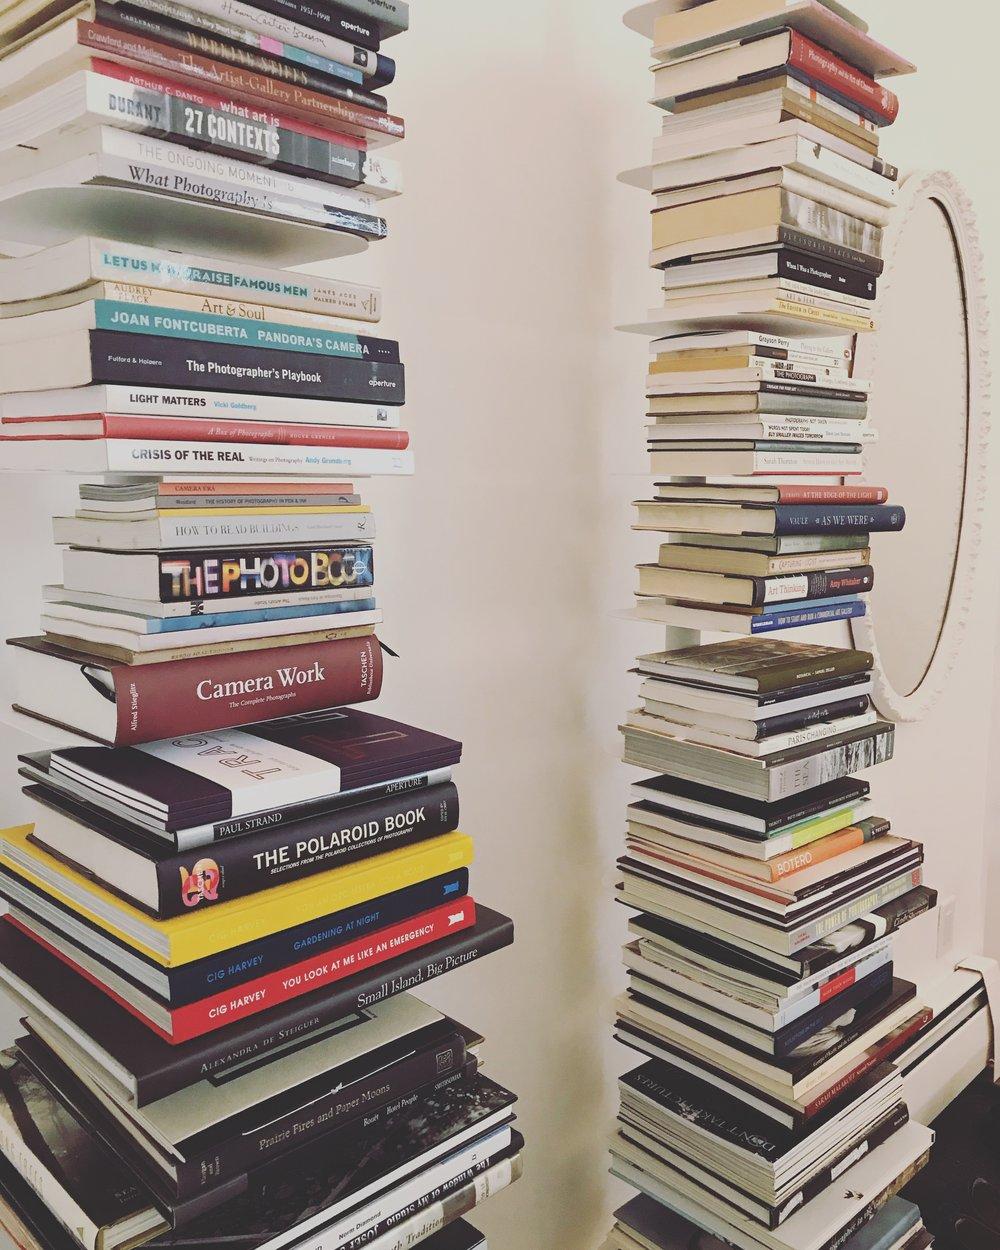 Kat's towering shelves.